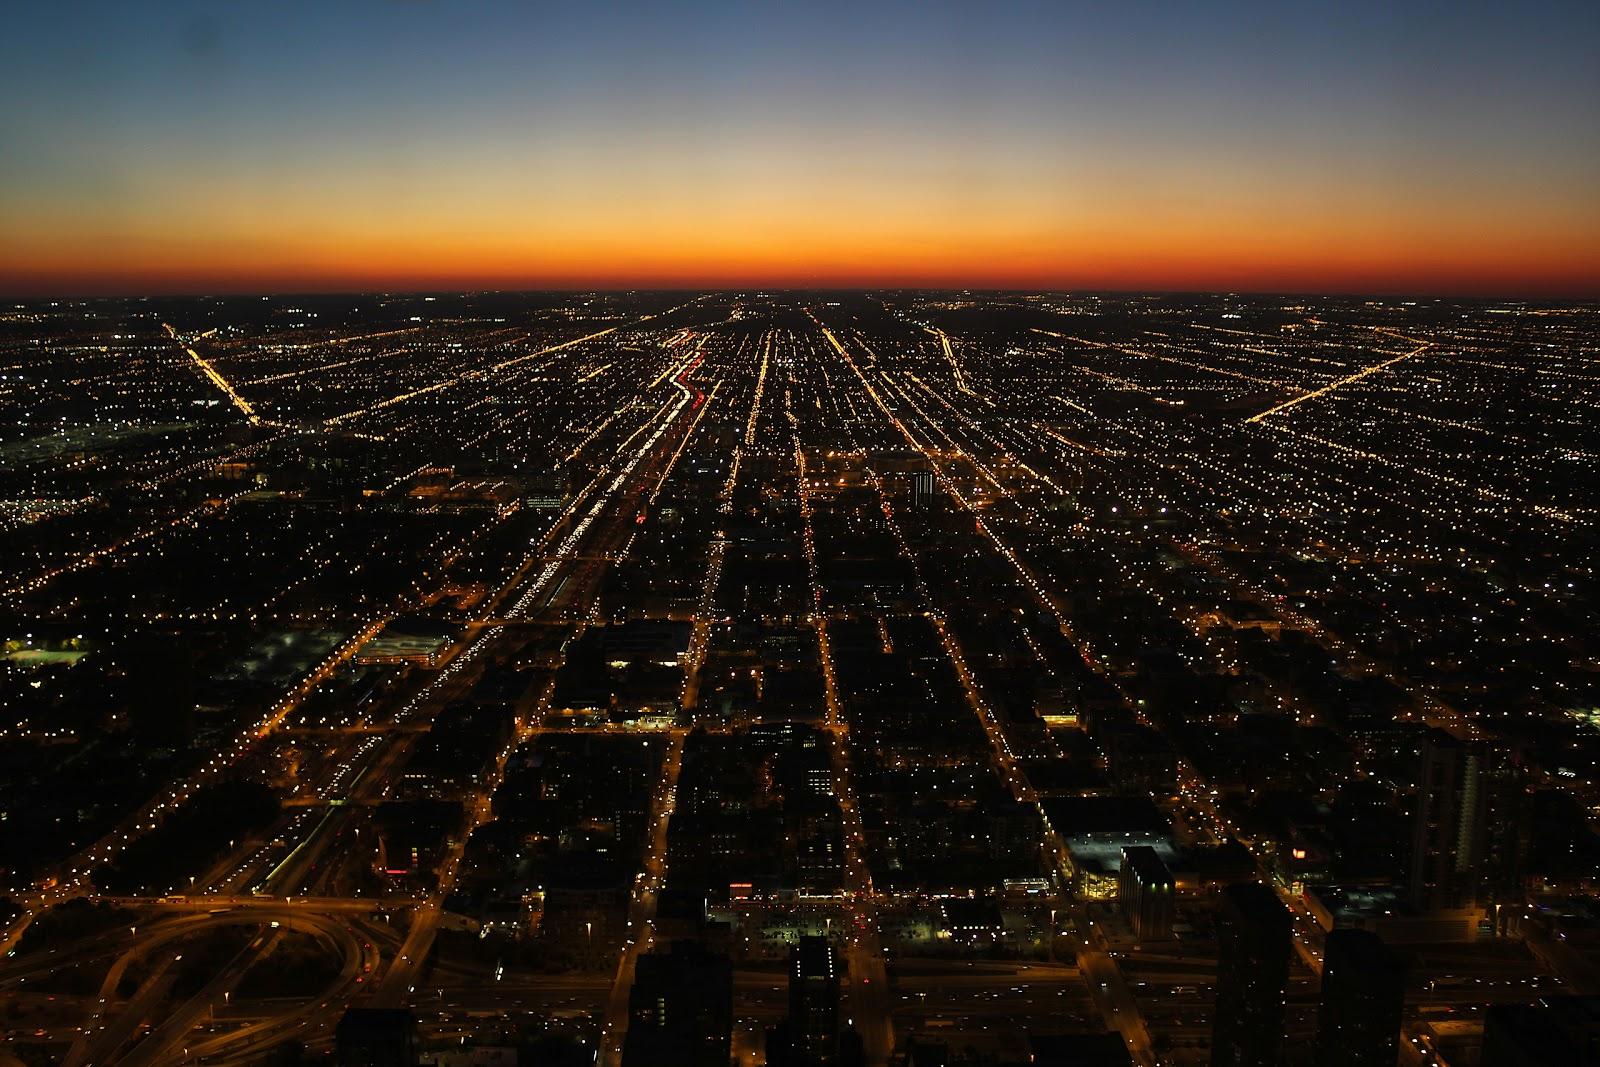 http://1.bp.blogspot.com/-DBxIHFBc_zs/UI34N6P6T9I/AAAAAAAAFrc/8Y58Oc_SepM/s1600/Chicago+sunset+wallpaper.jpg